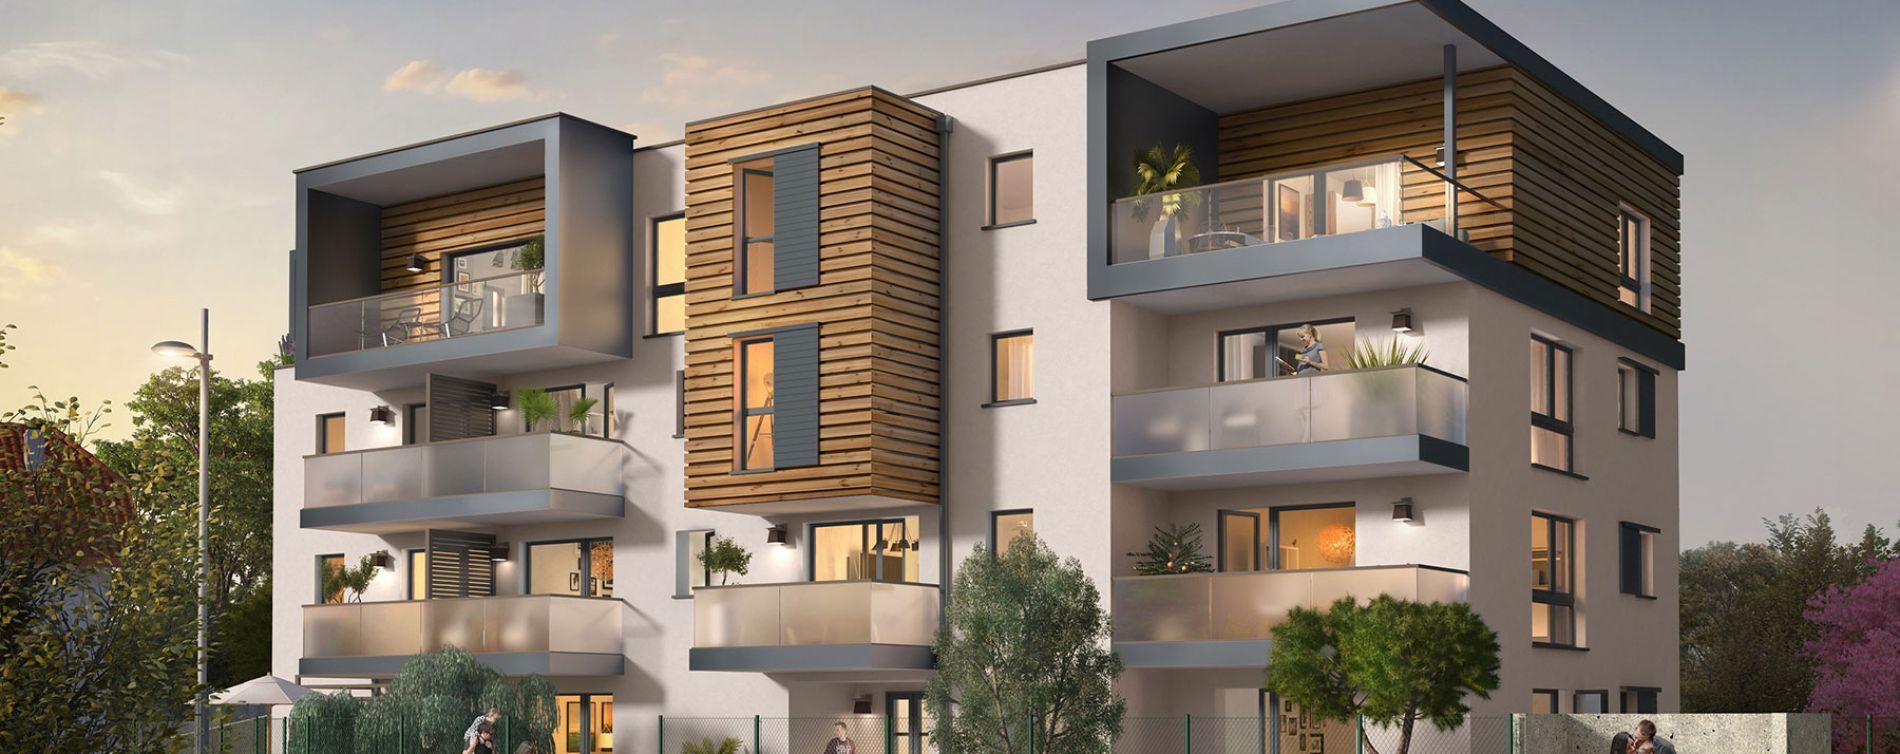 Annemasse : programme immobilier neuve « Duomo »